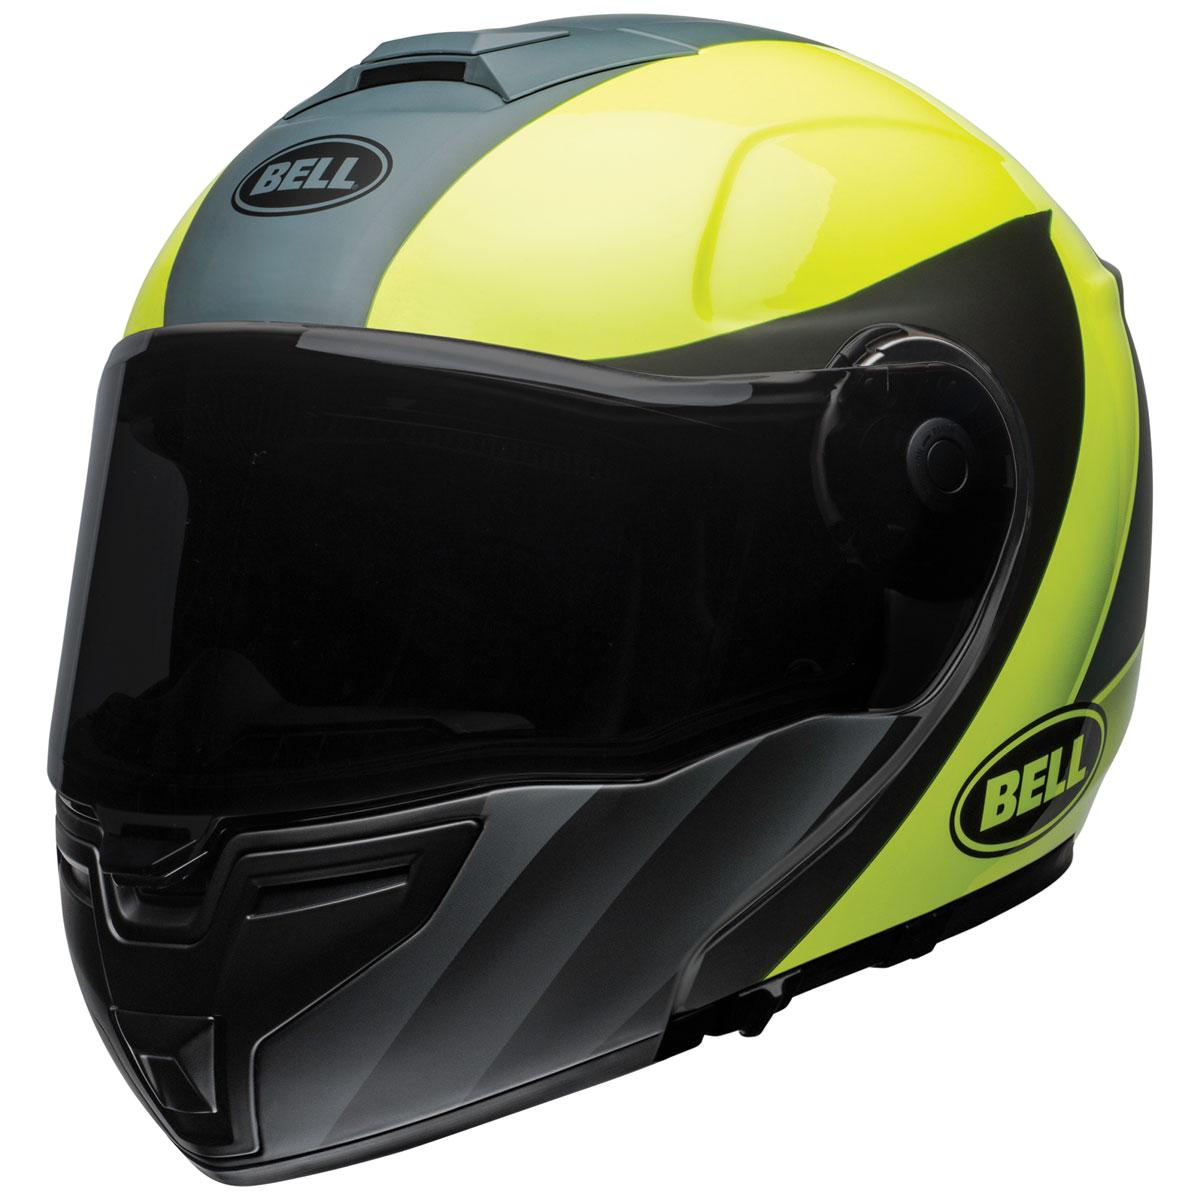 Bell SRT Modular Presence Gray/Hi-Viz Yellow Modular Helmet